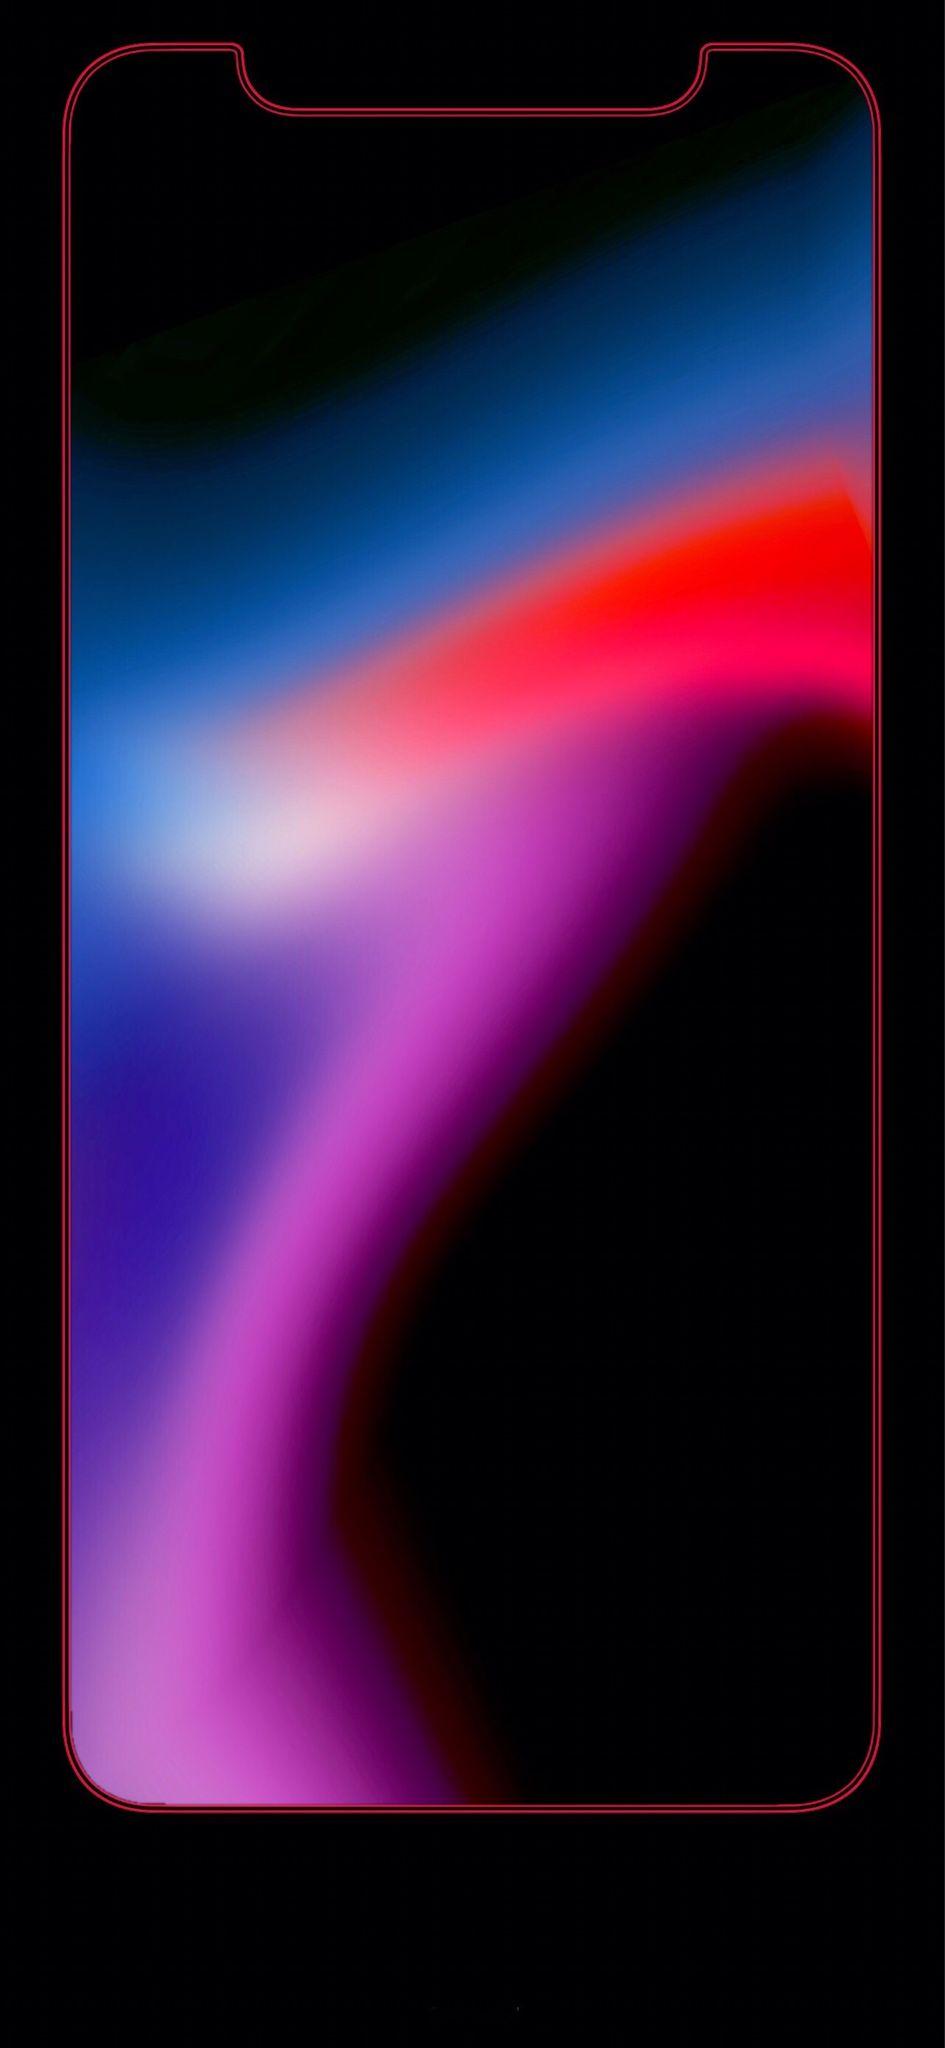 Dope Iphone X Wallpaper Hd